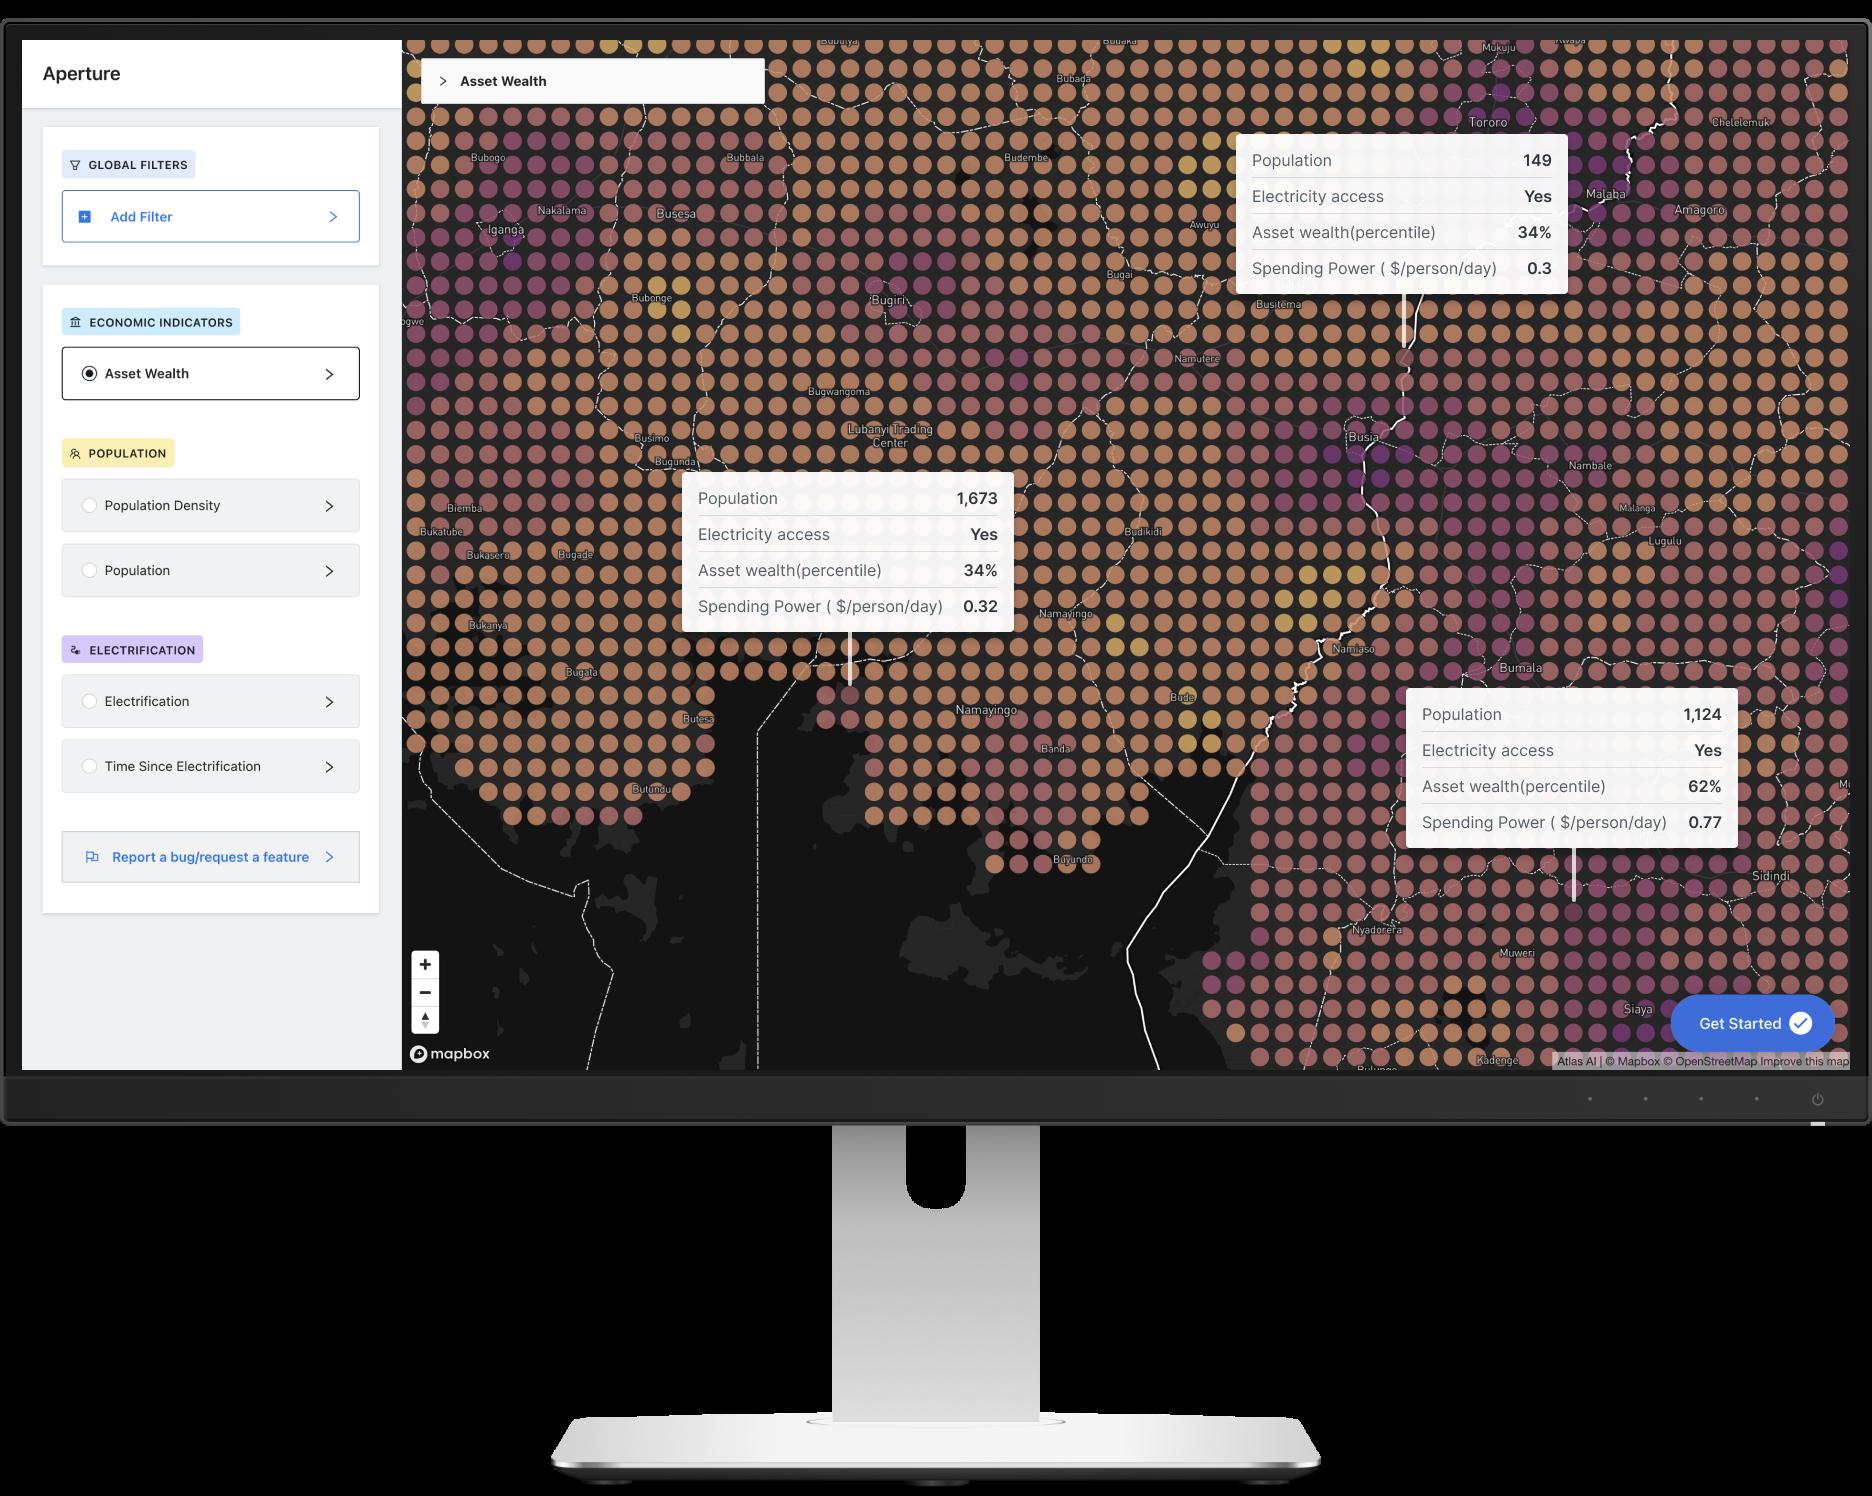 Desktop view illustration of the Aperture product